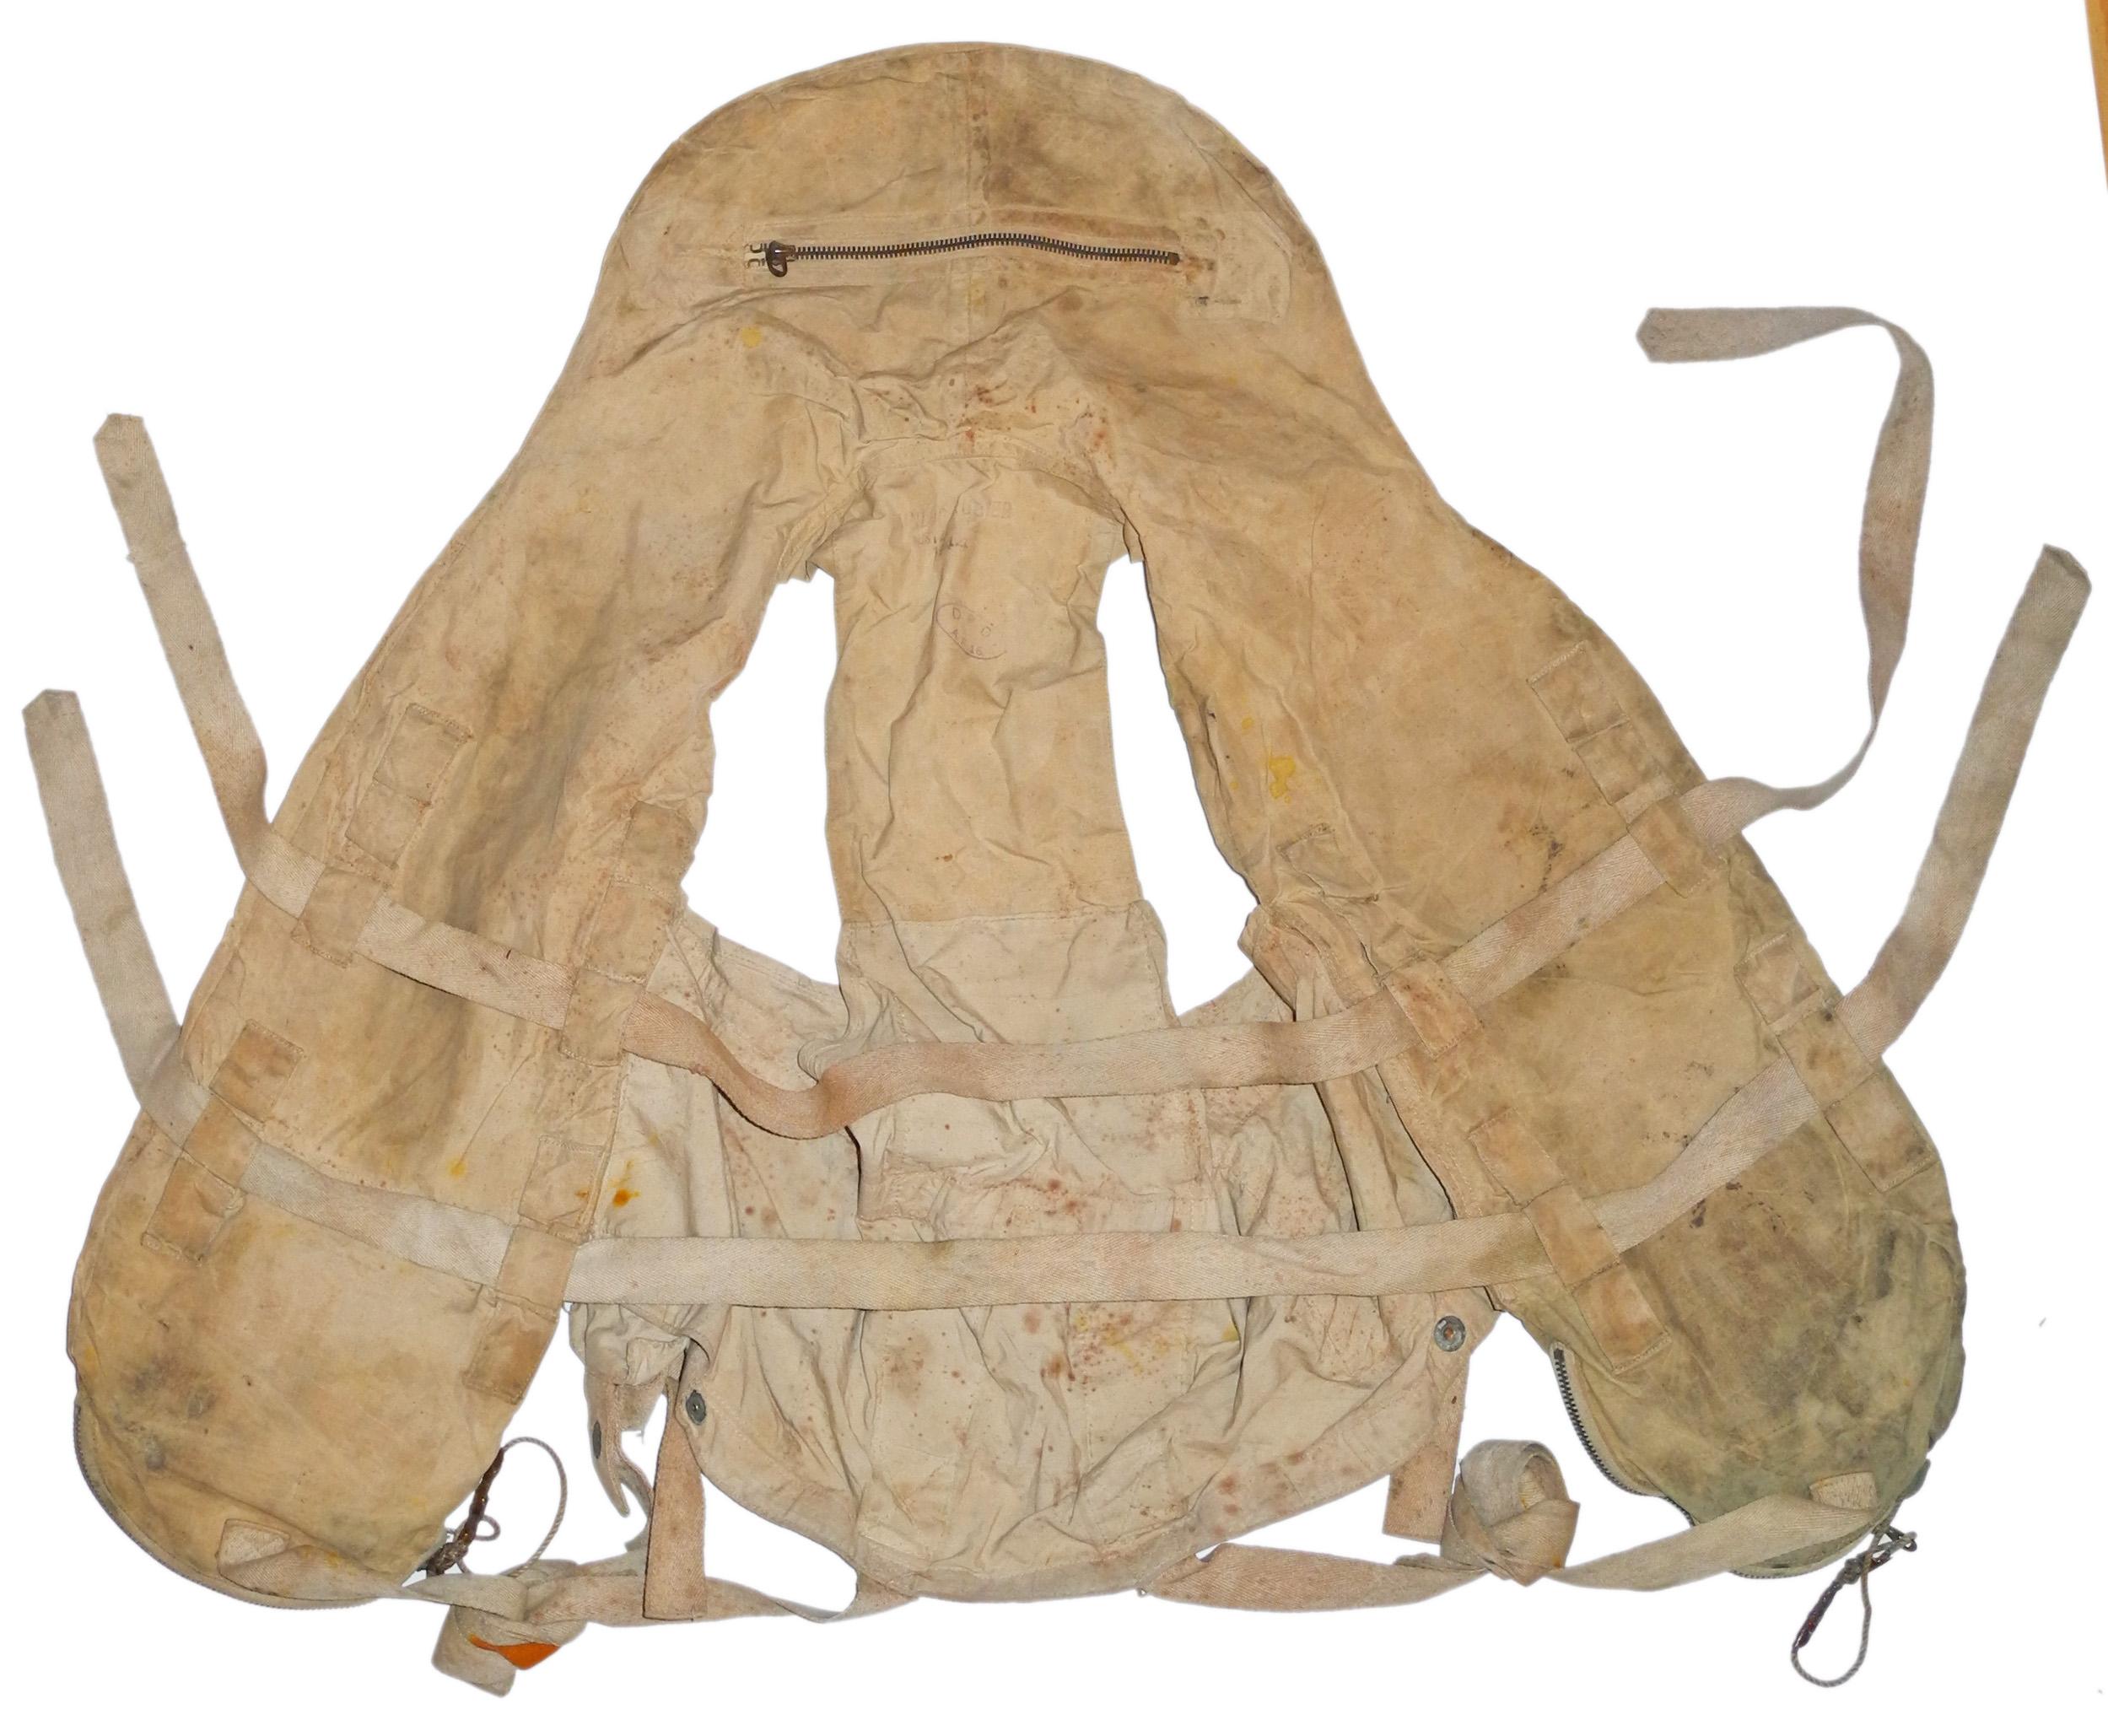 RAAF Tropical Life Vest